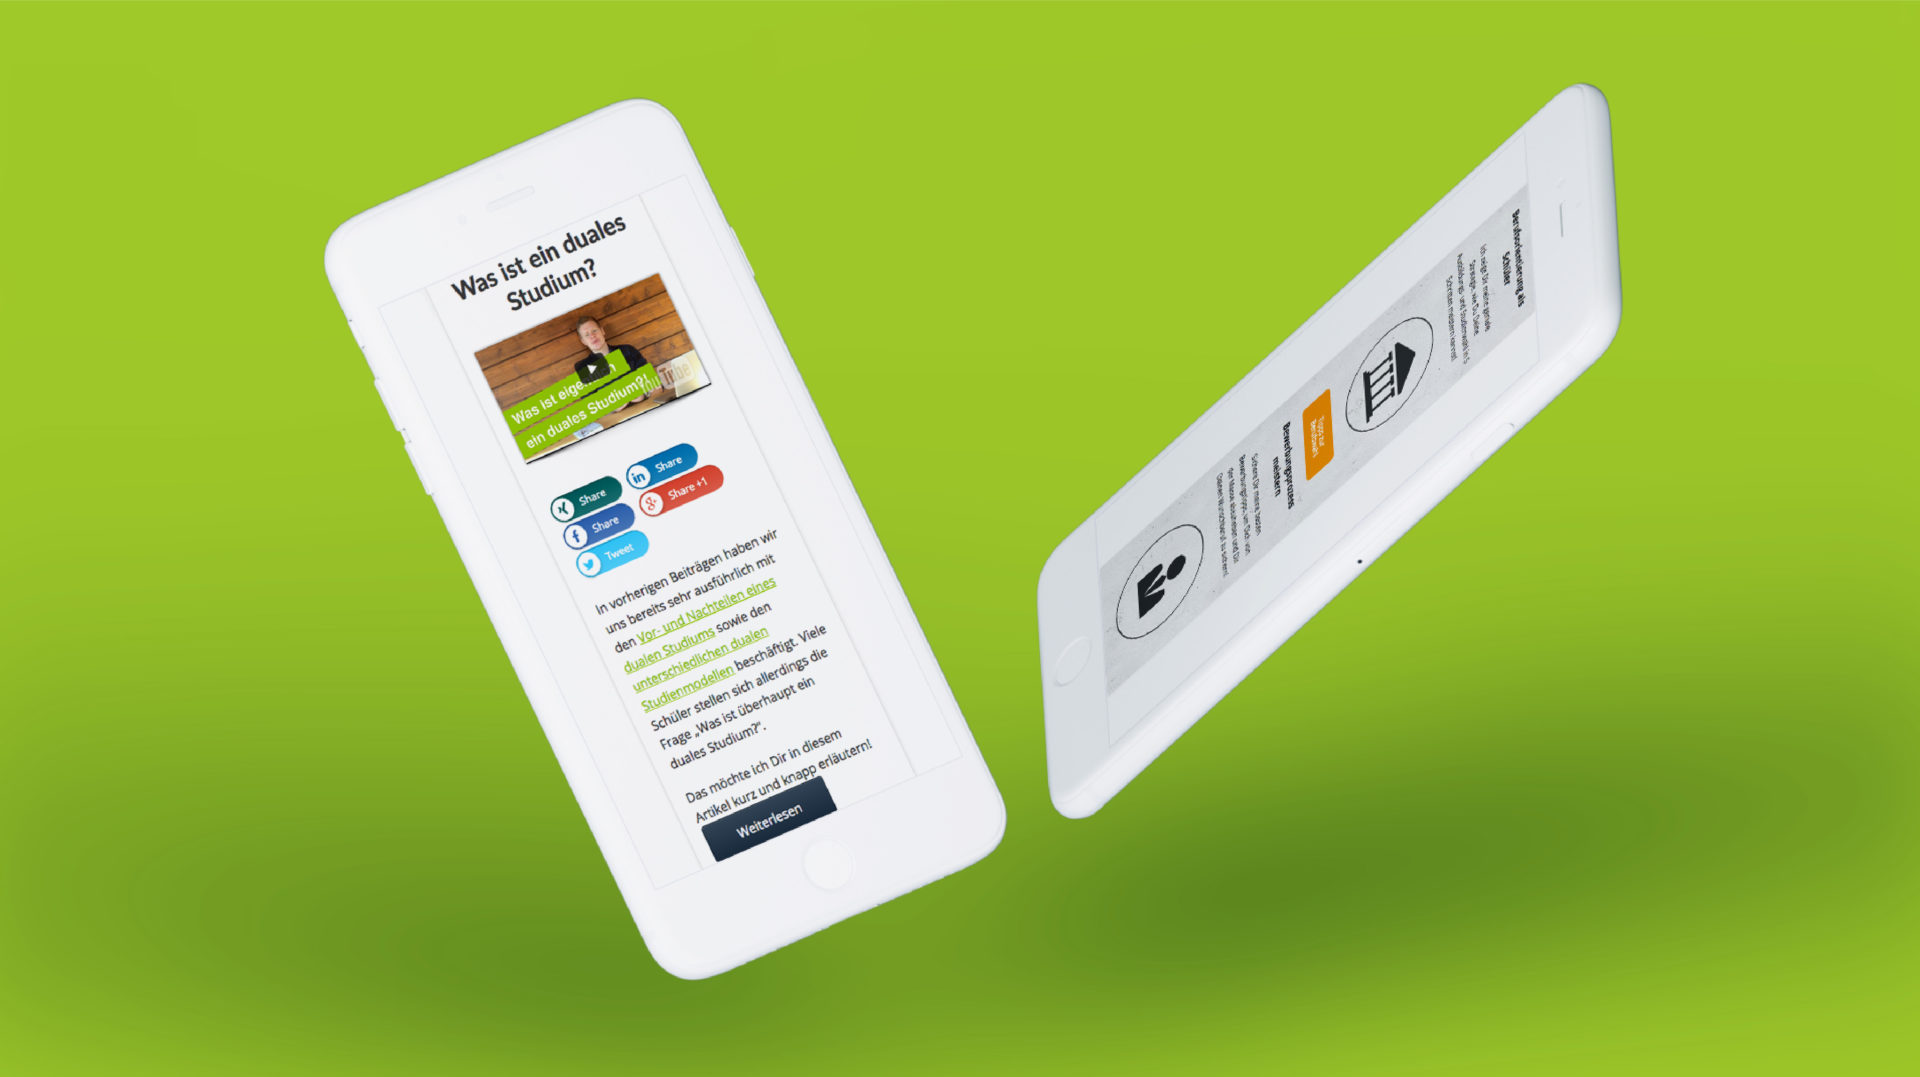 Karriere Navi Referenz 3. Mobile Responsive Webdesign. Mobile Responsive Webdesign